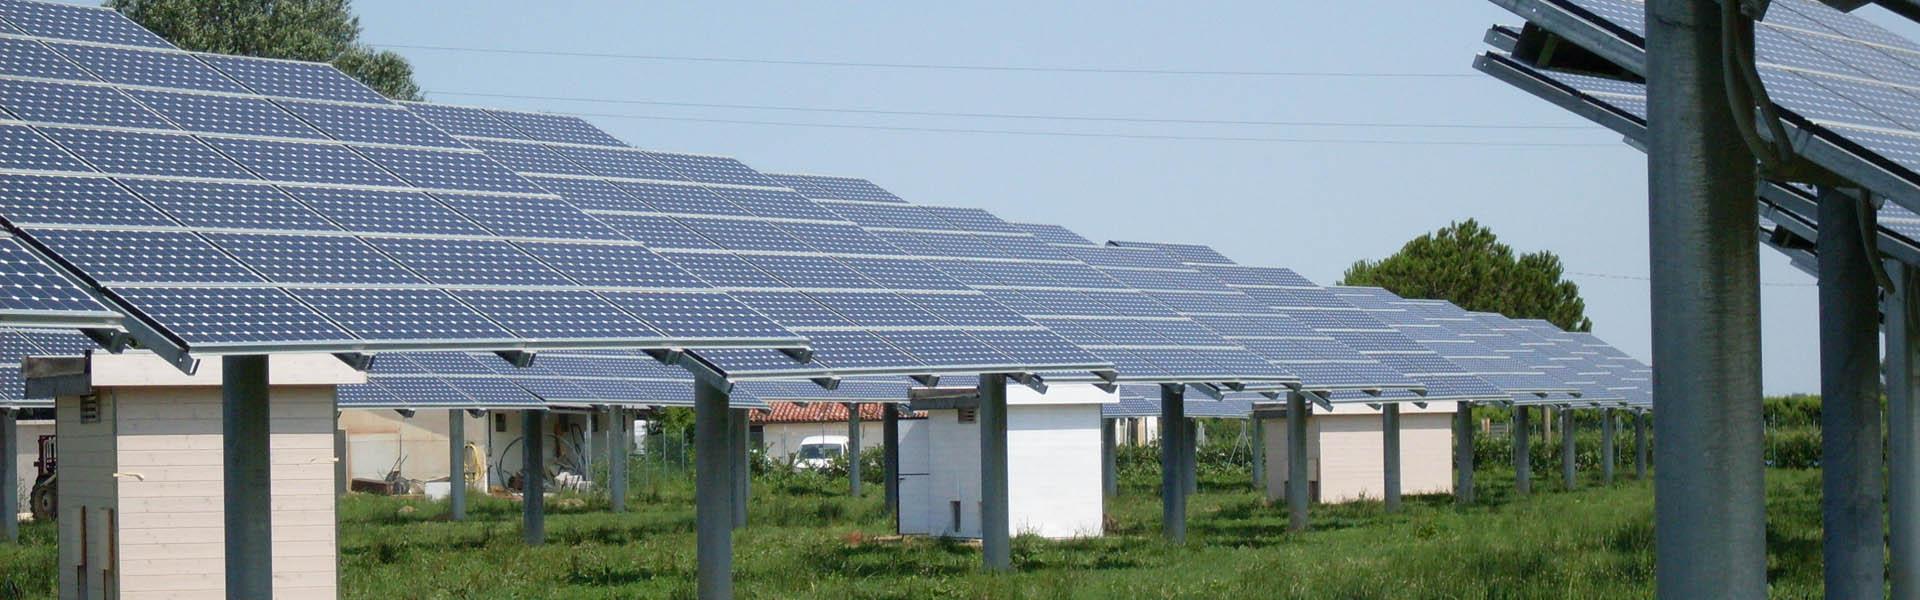 incentivo-fotovoltaico